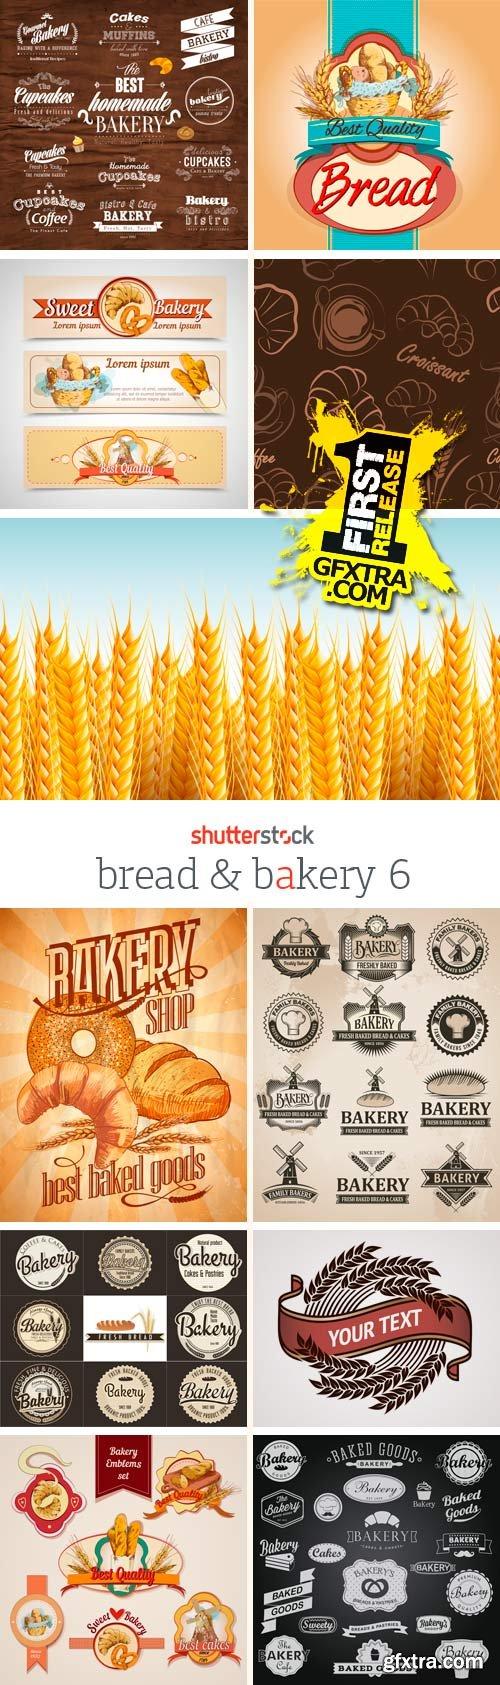 Amazing SS - Bread & Bakery 6, 25xEPS